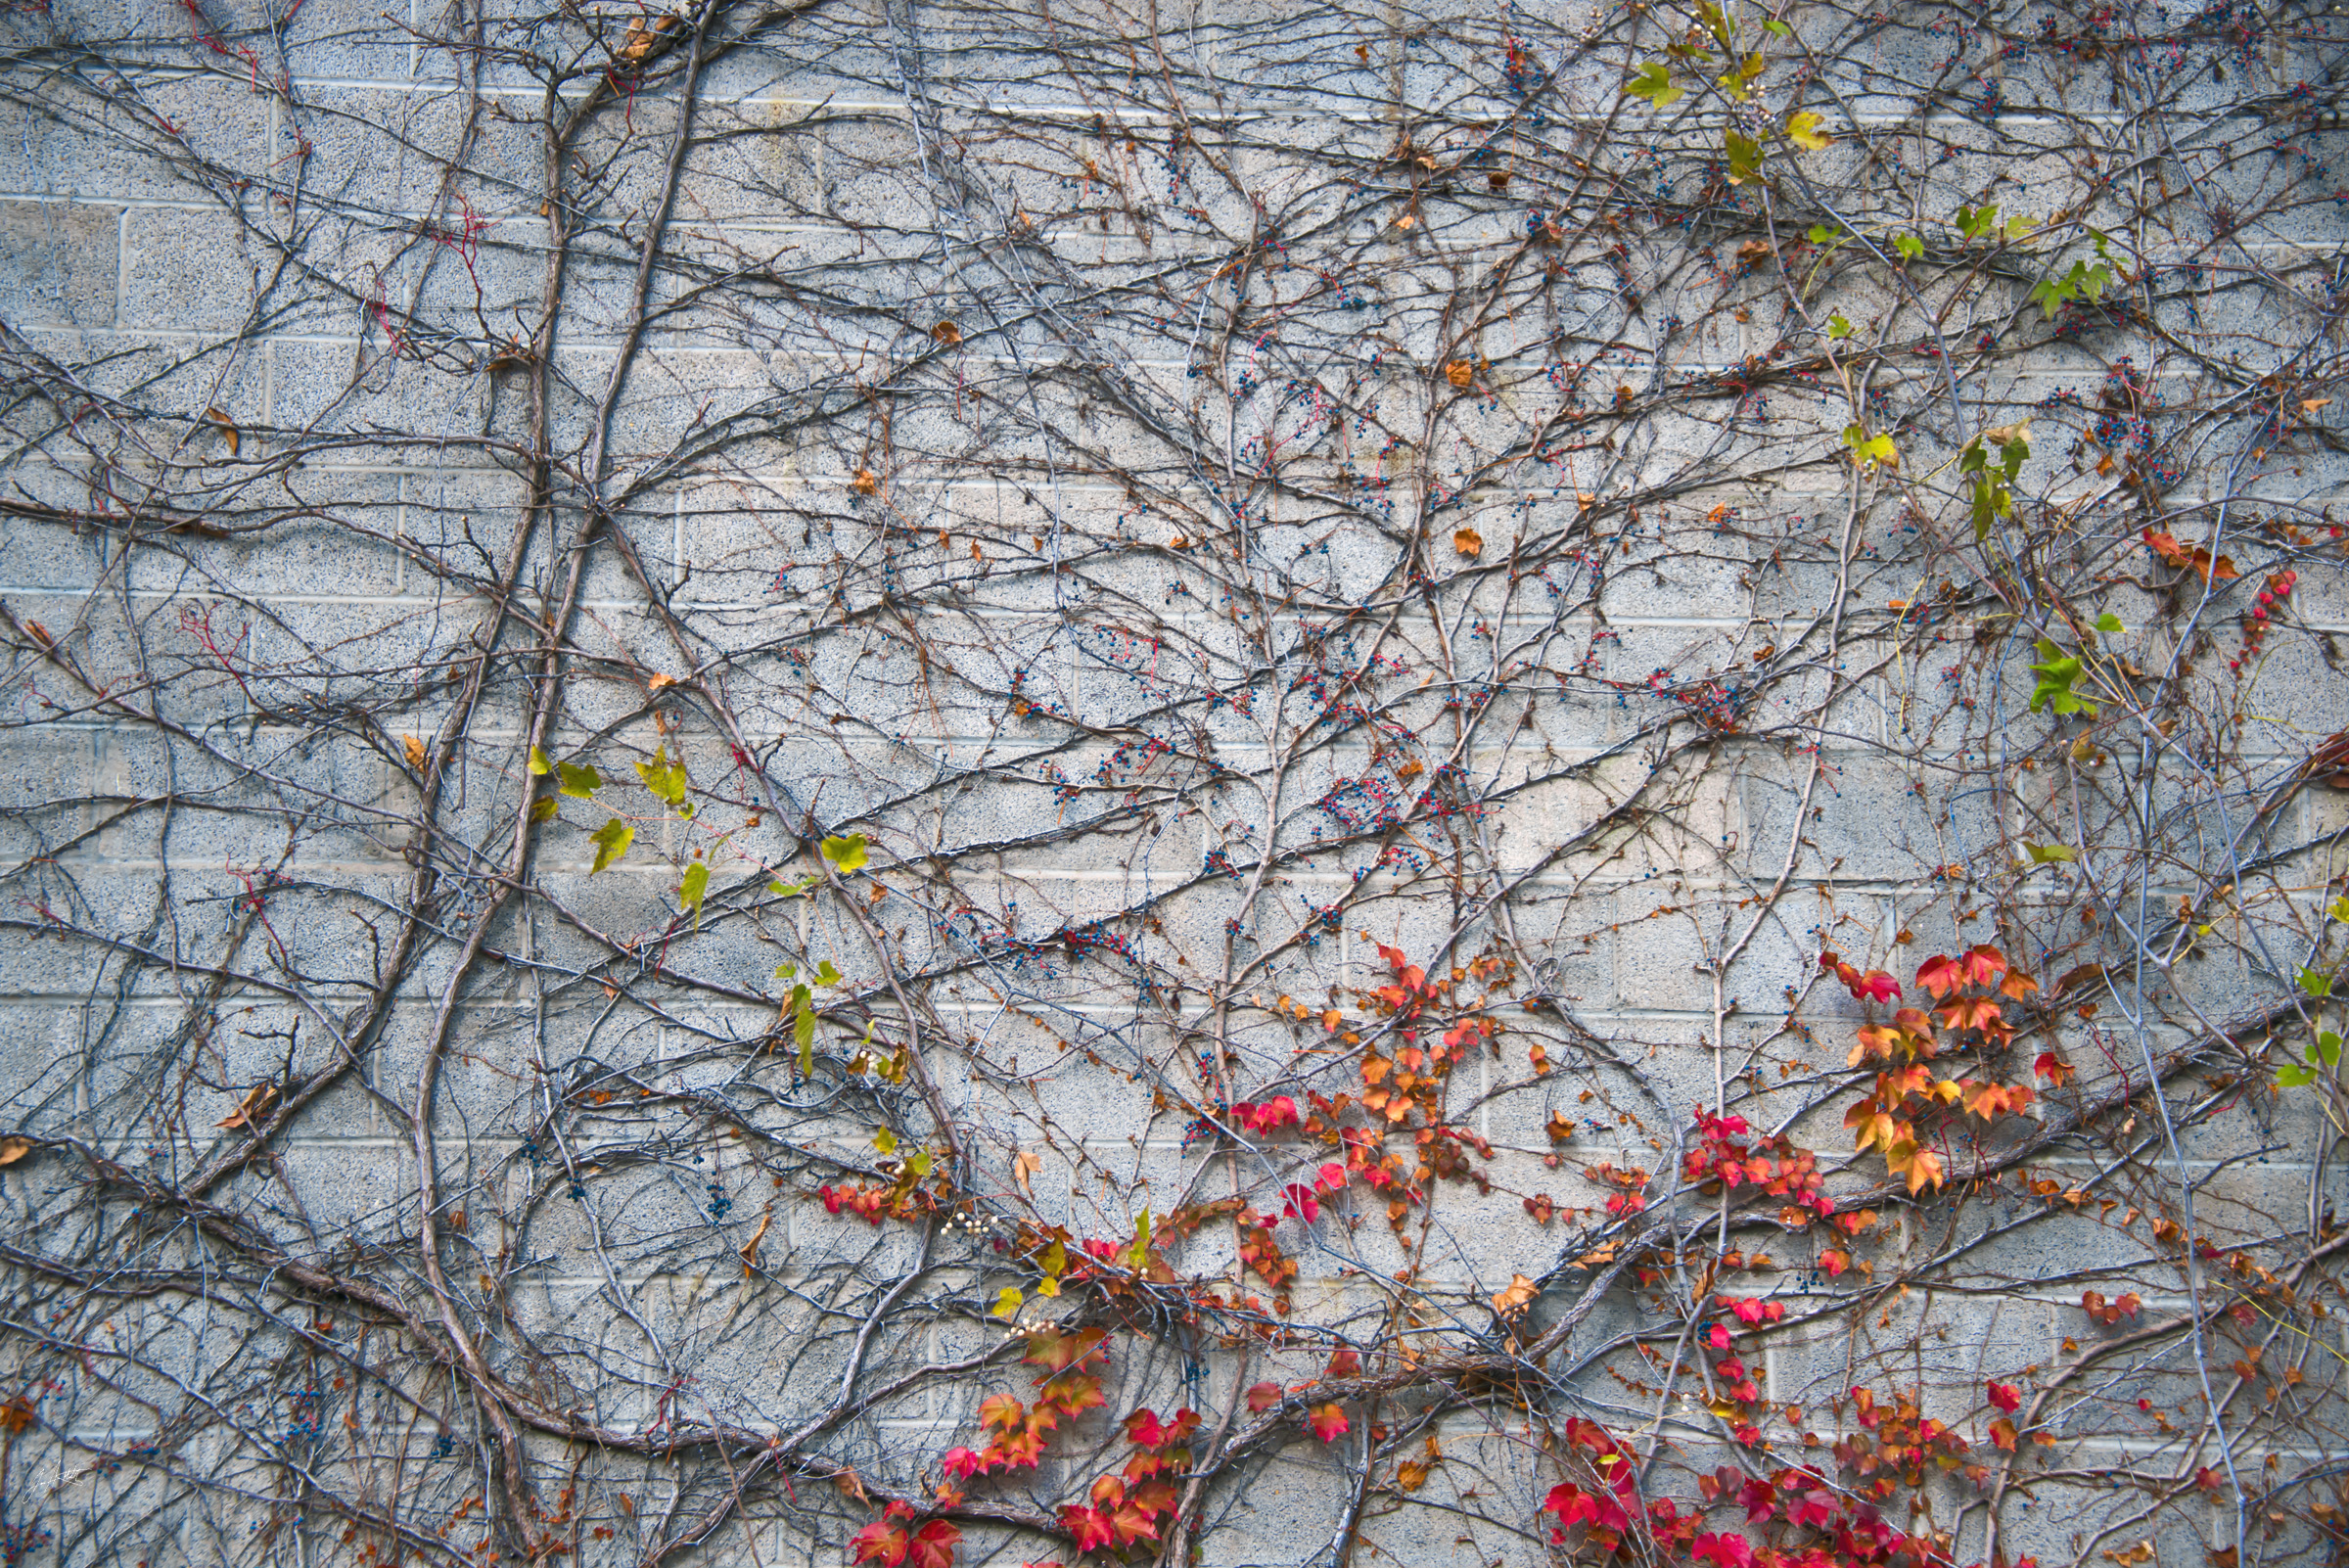 Day325_Vines_November 22